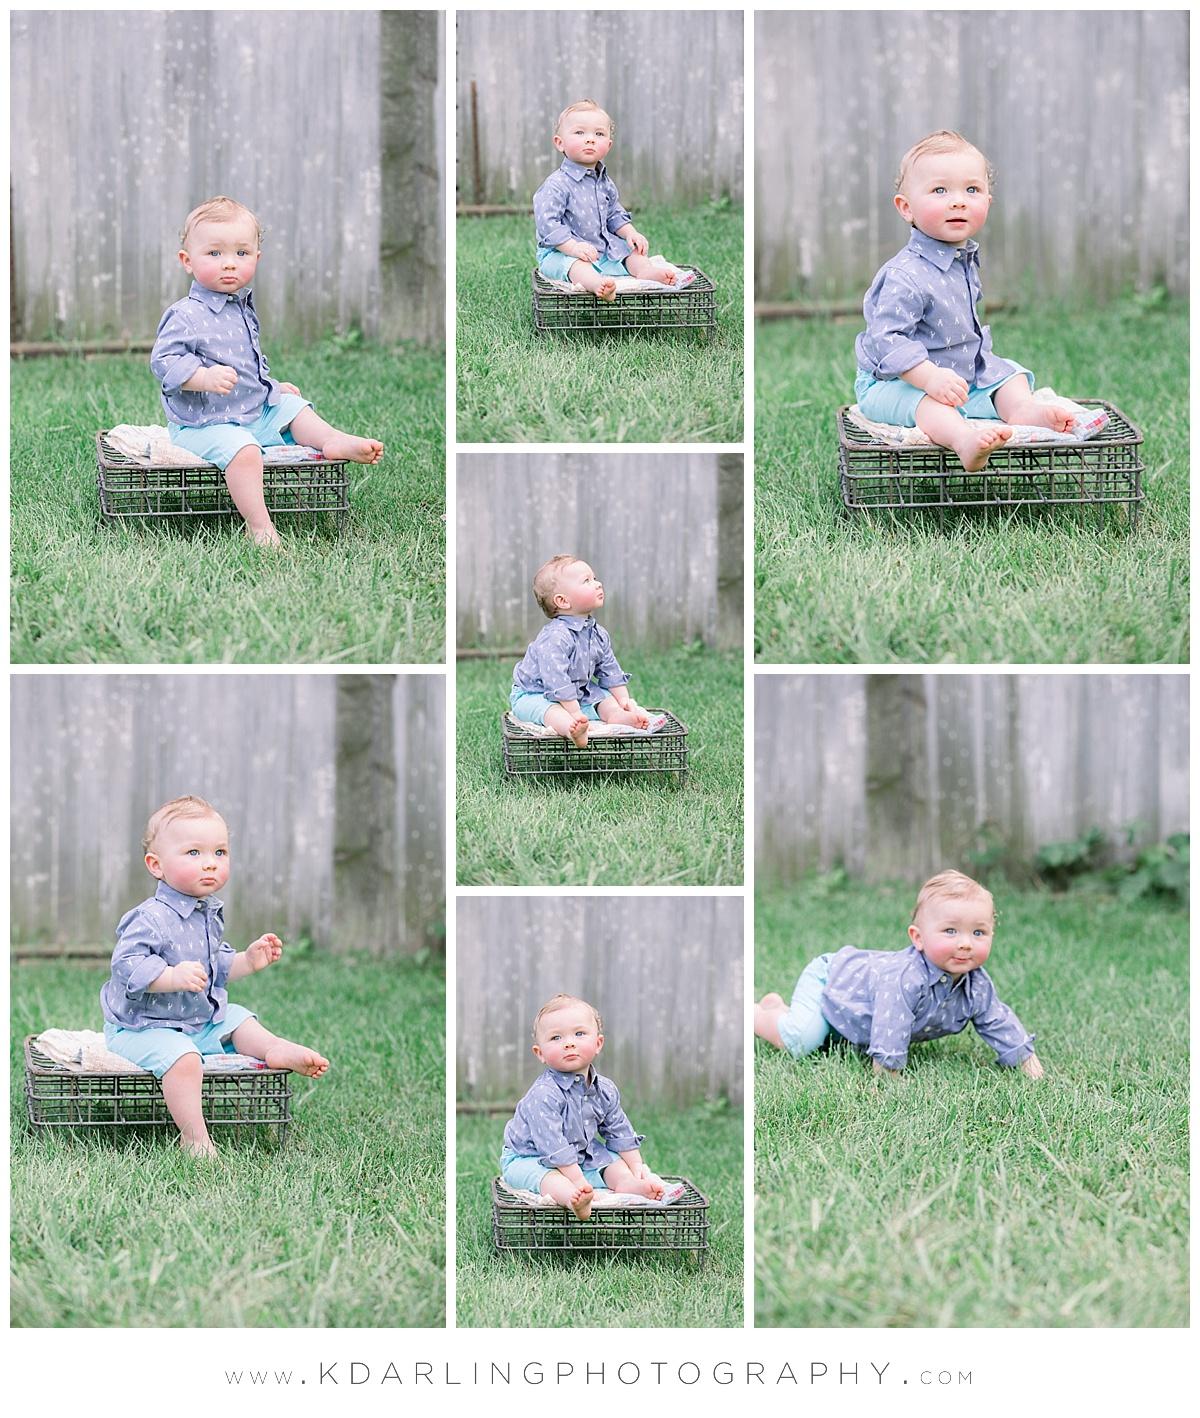 Central-Illinois-baby-child-photographer-first-birthday-boy-cake-smash_0466.jpg